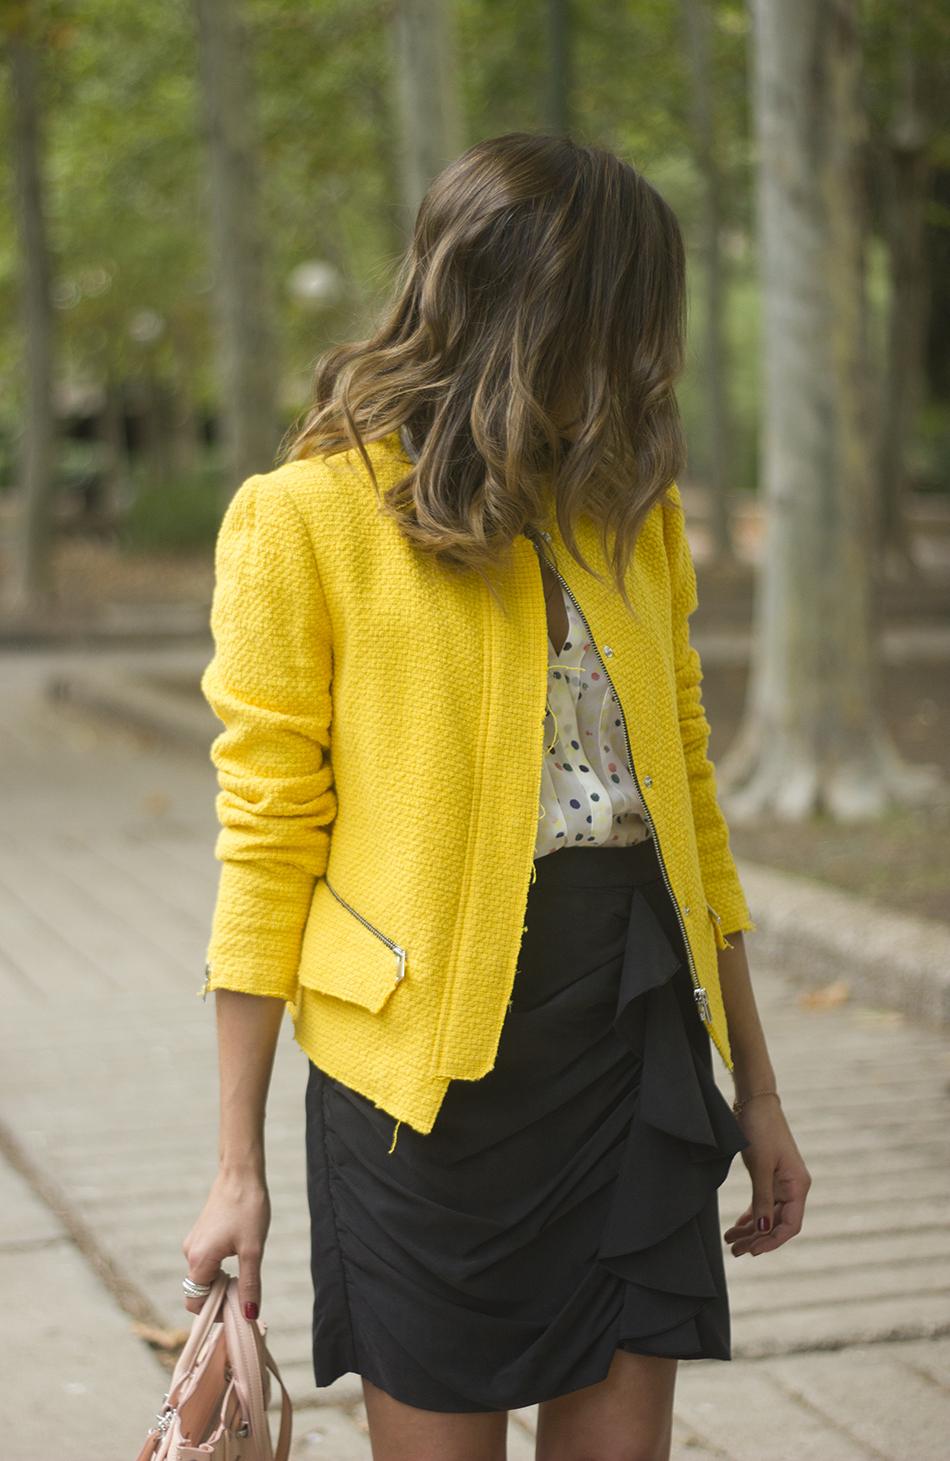 Yellow Jacket Draped Grey Skirt Outfit18